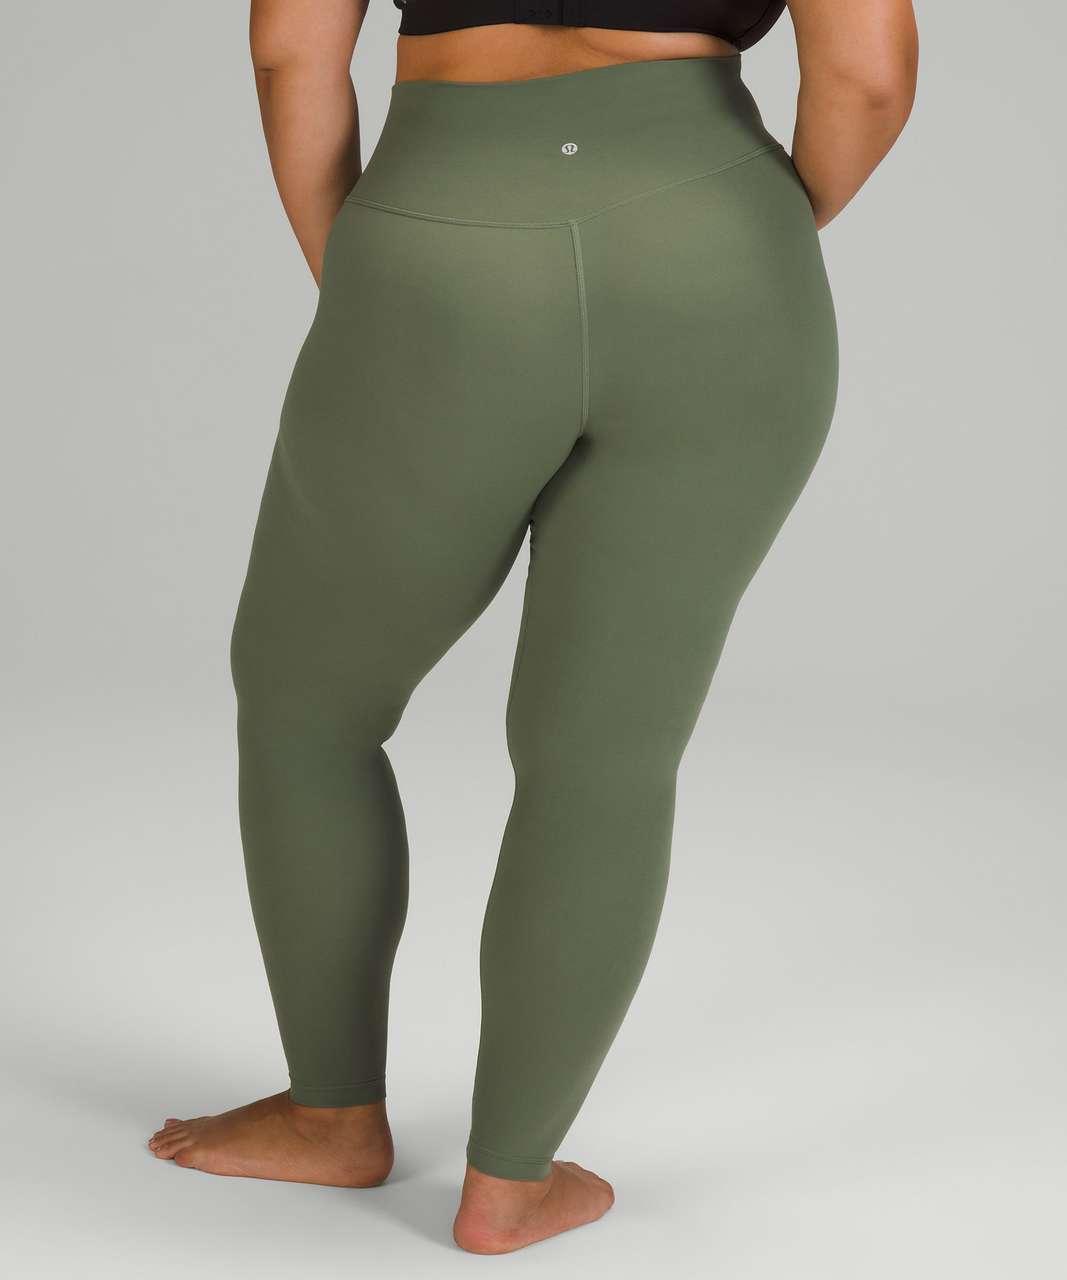 "Lululemon Align High-Rise Pant 28"" - Green Twill"